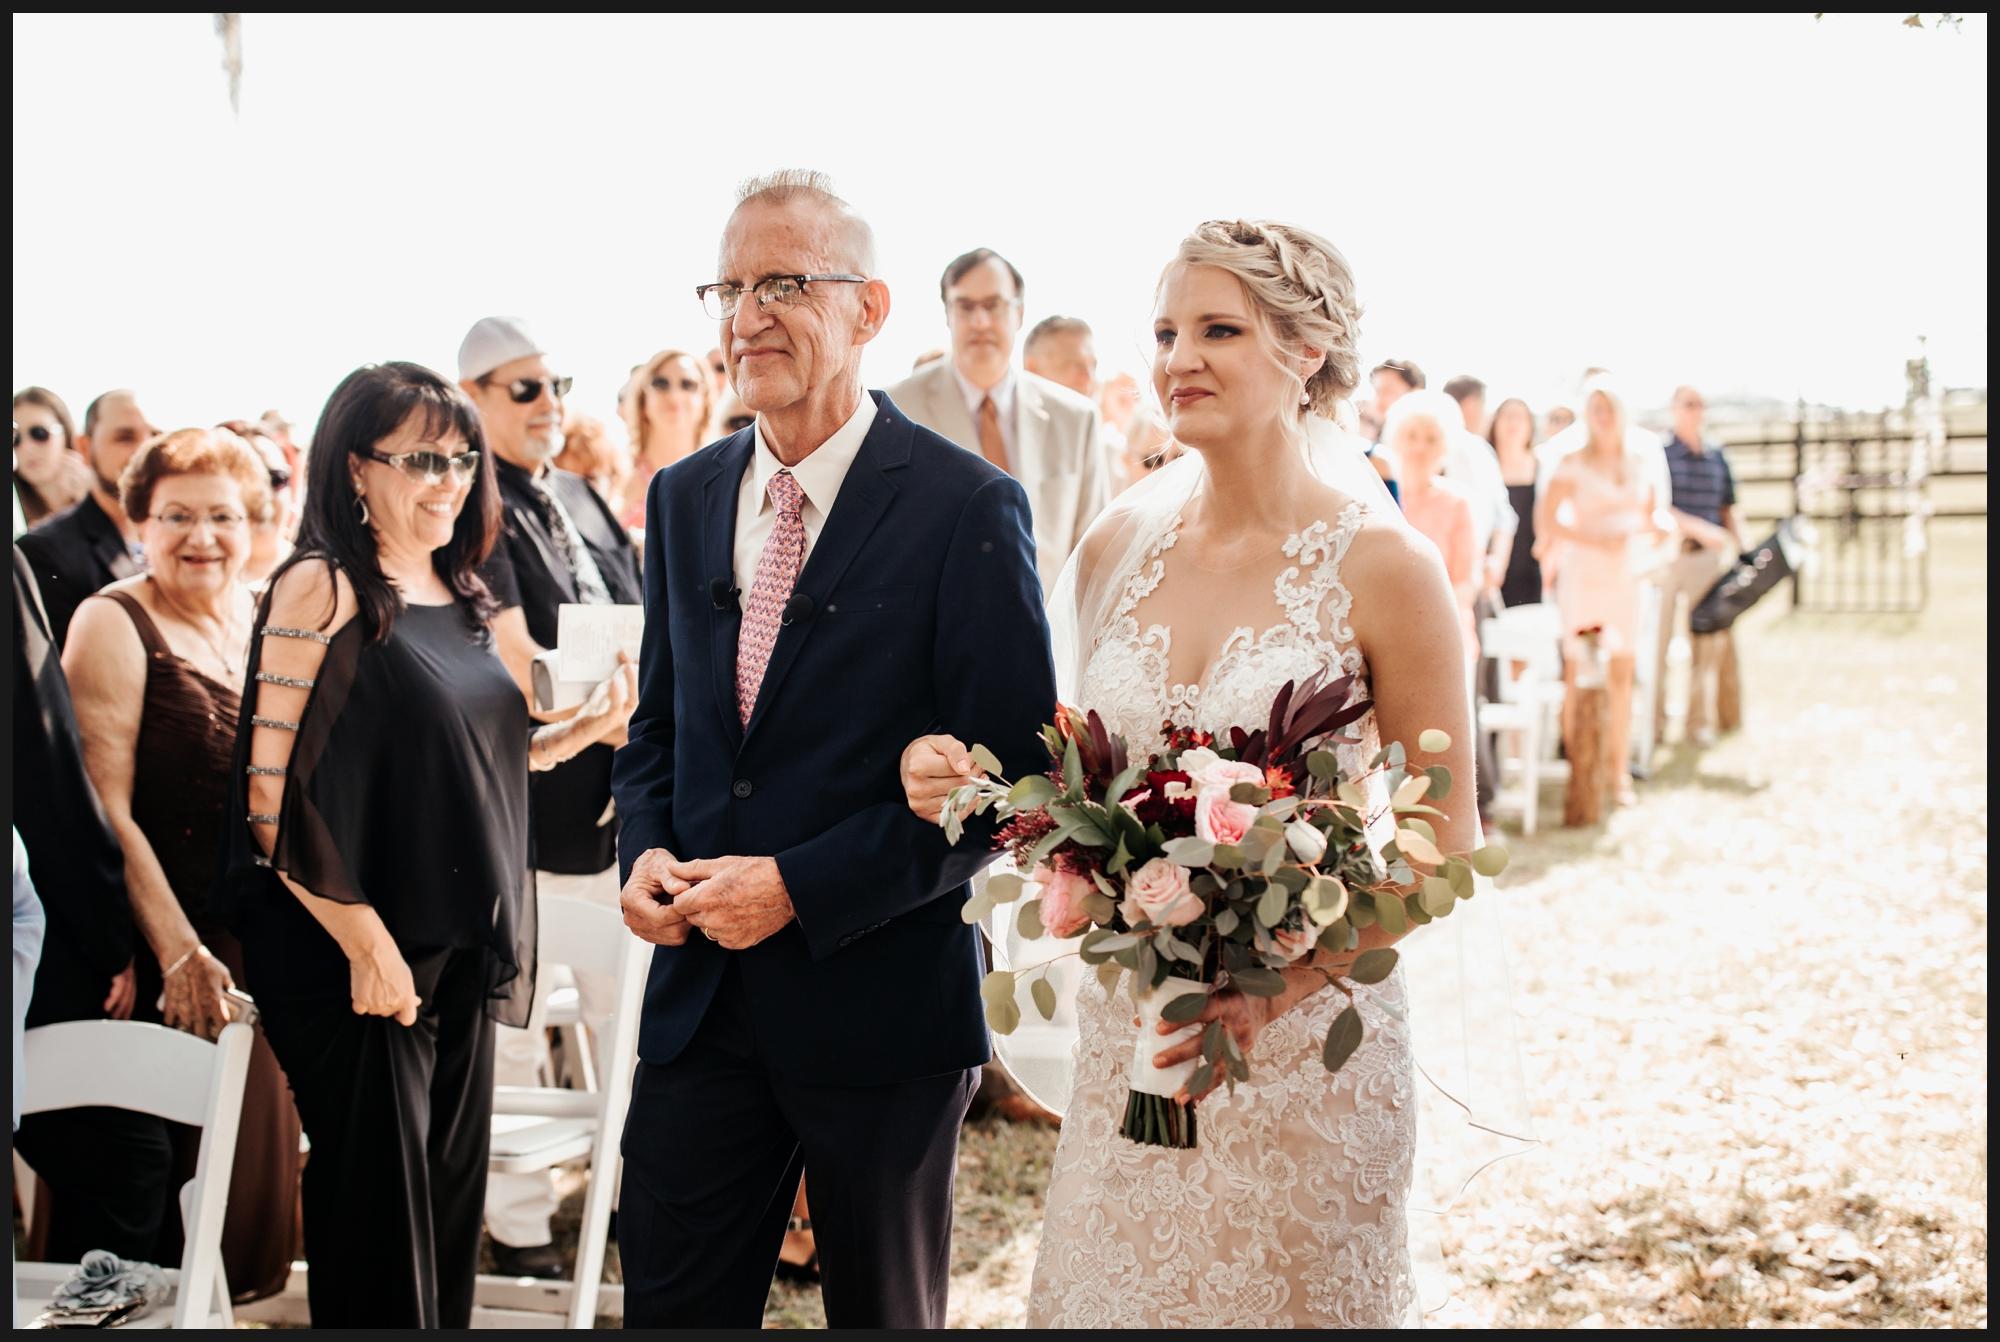 Orlando-Wedding-Photographer-destination-wedding-photographer-florida-wedding-photographer-hawaii-wedding-photographer_0594.jpg